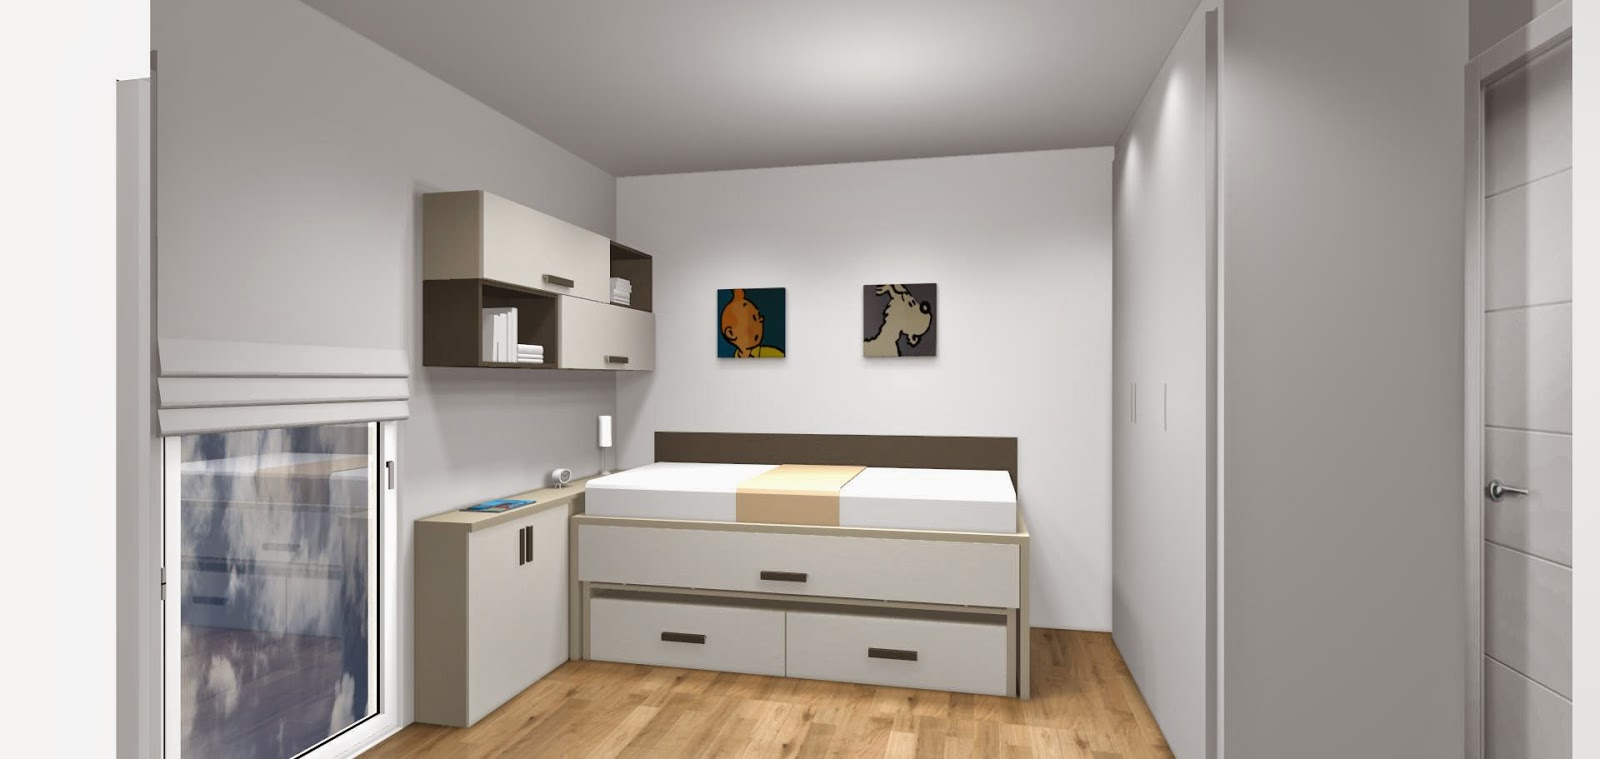 Dise o de cuartos o dormitorios juveniles for Habitaciones juveniles a medida